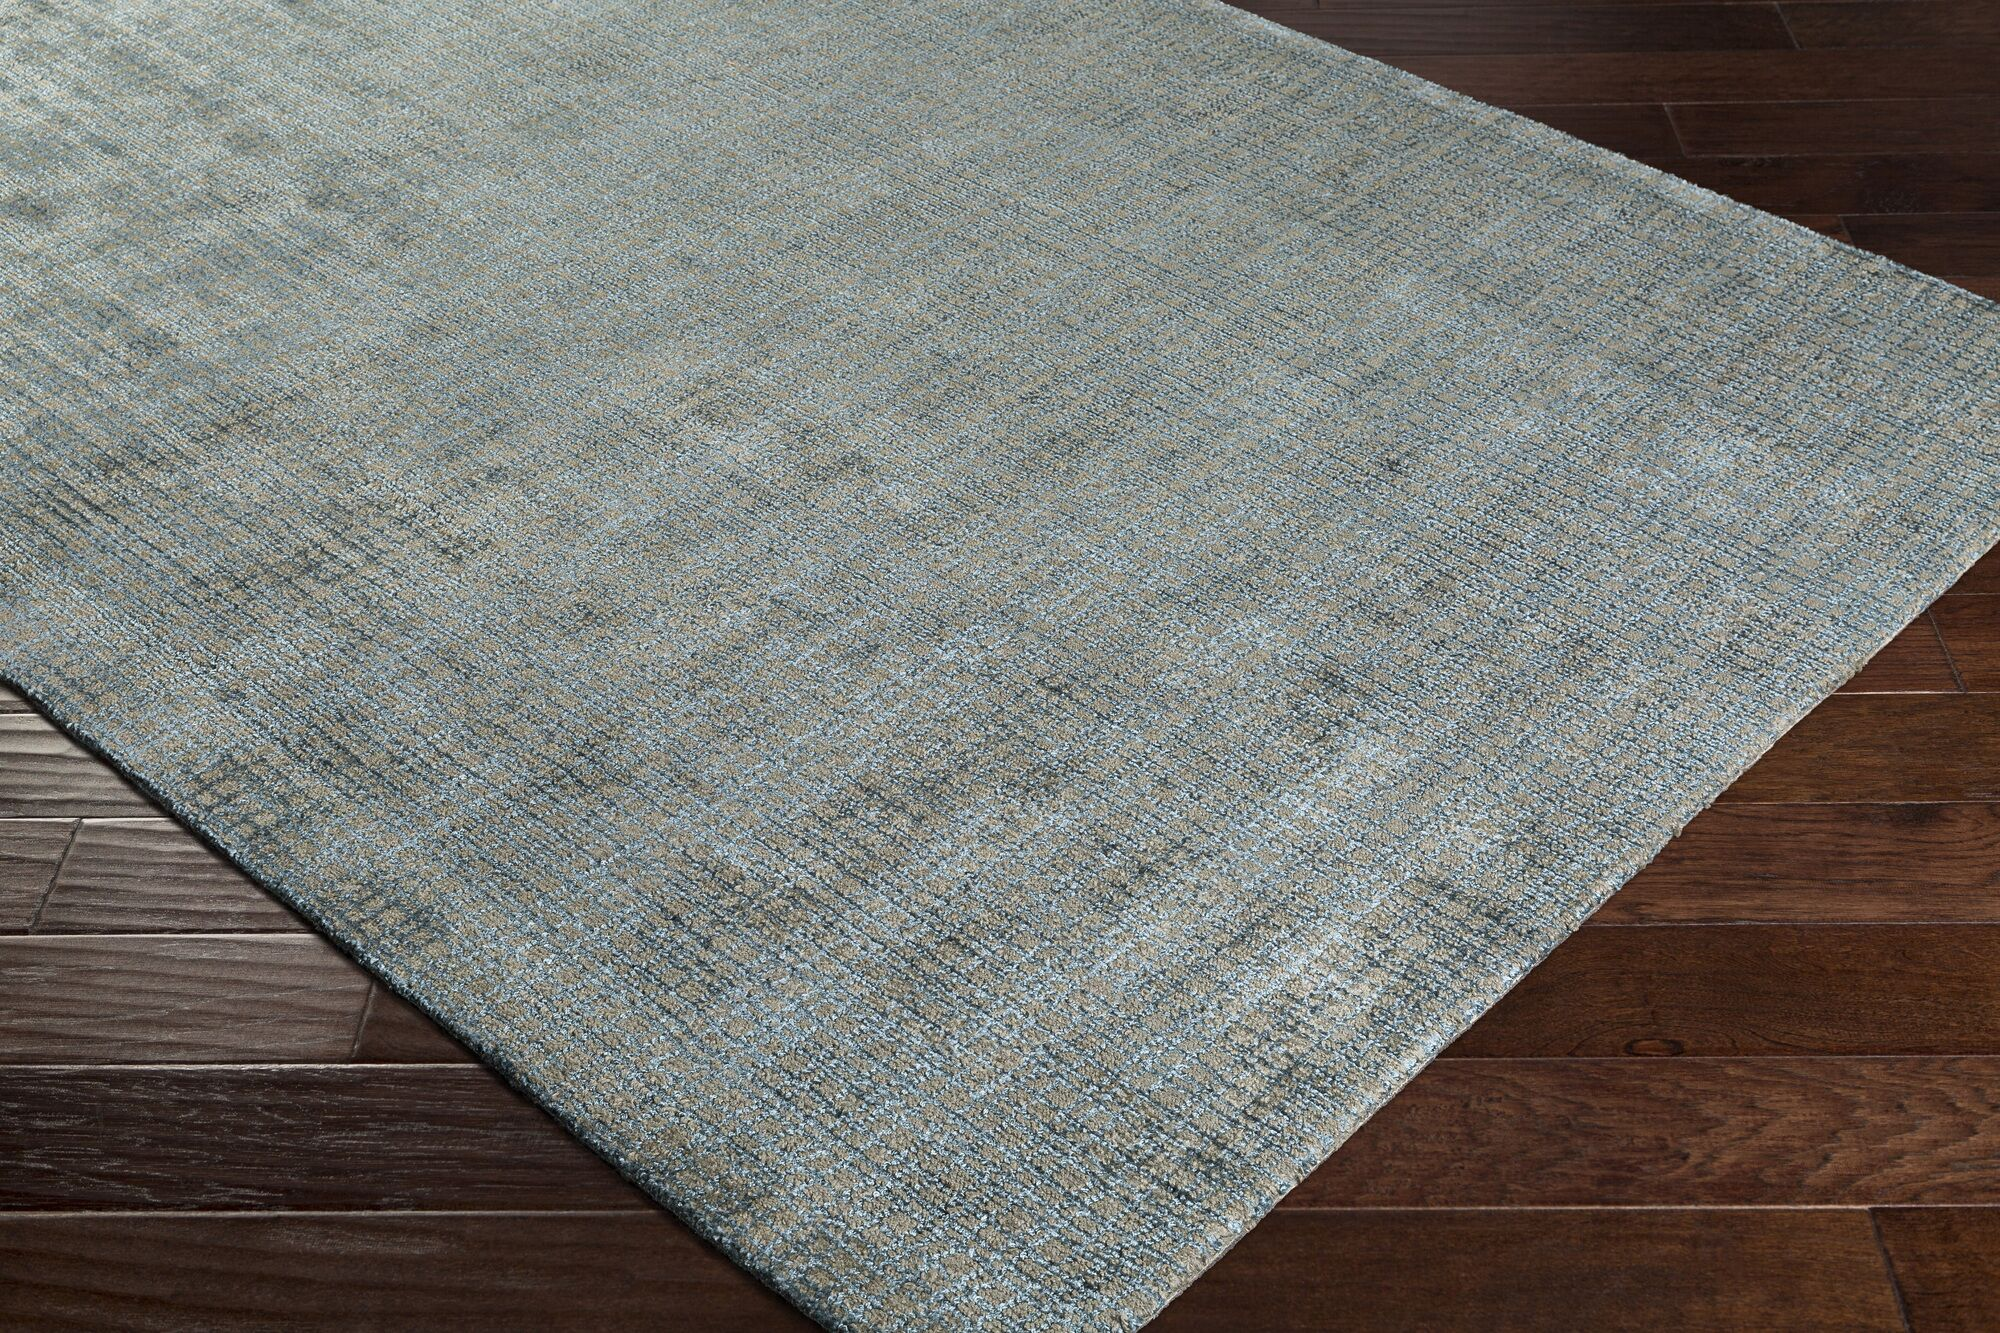 Dili Hand-Woven Silk Teal/Brown Area Rug Rug Size: Rectangle 5' x 7'6